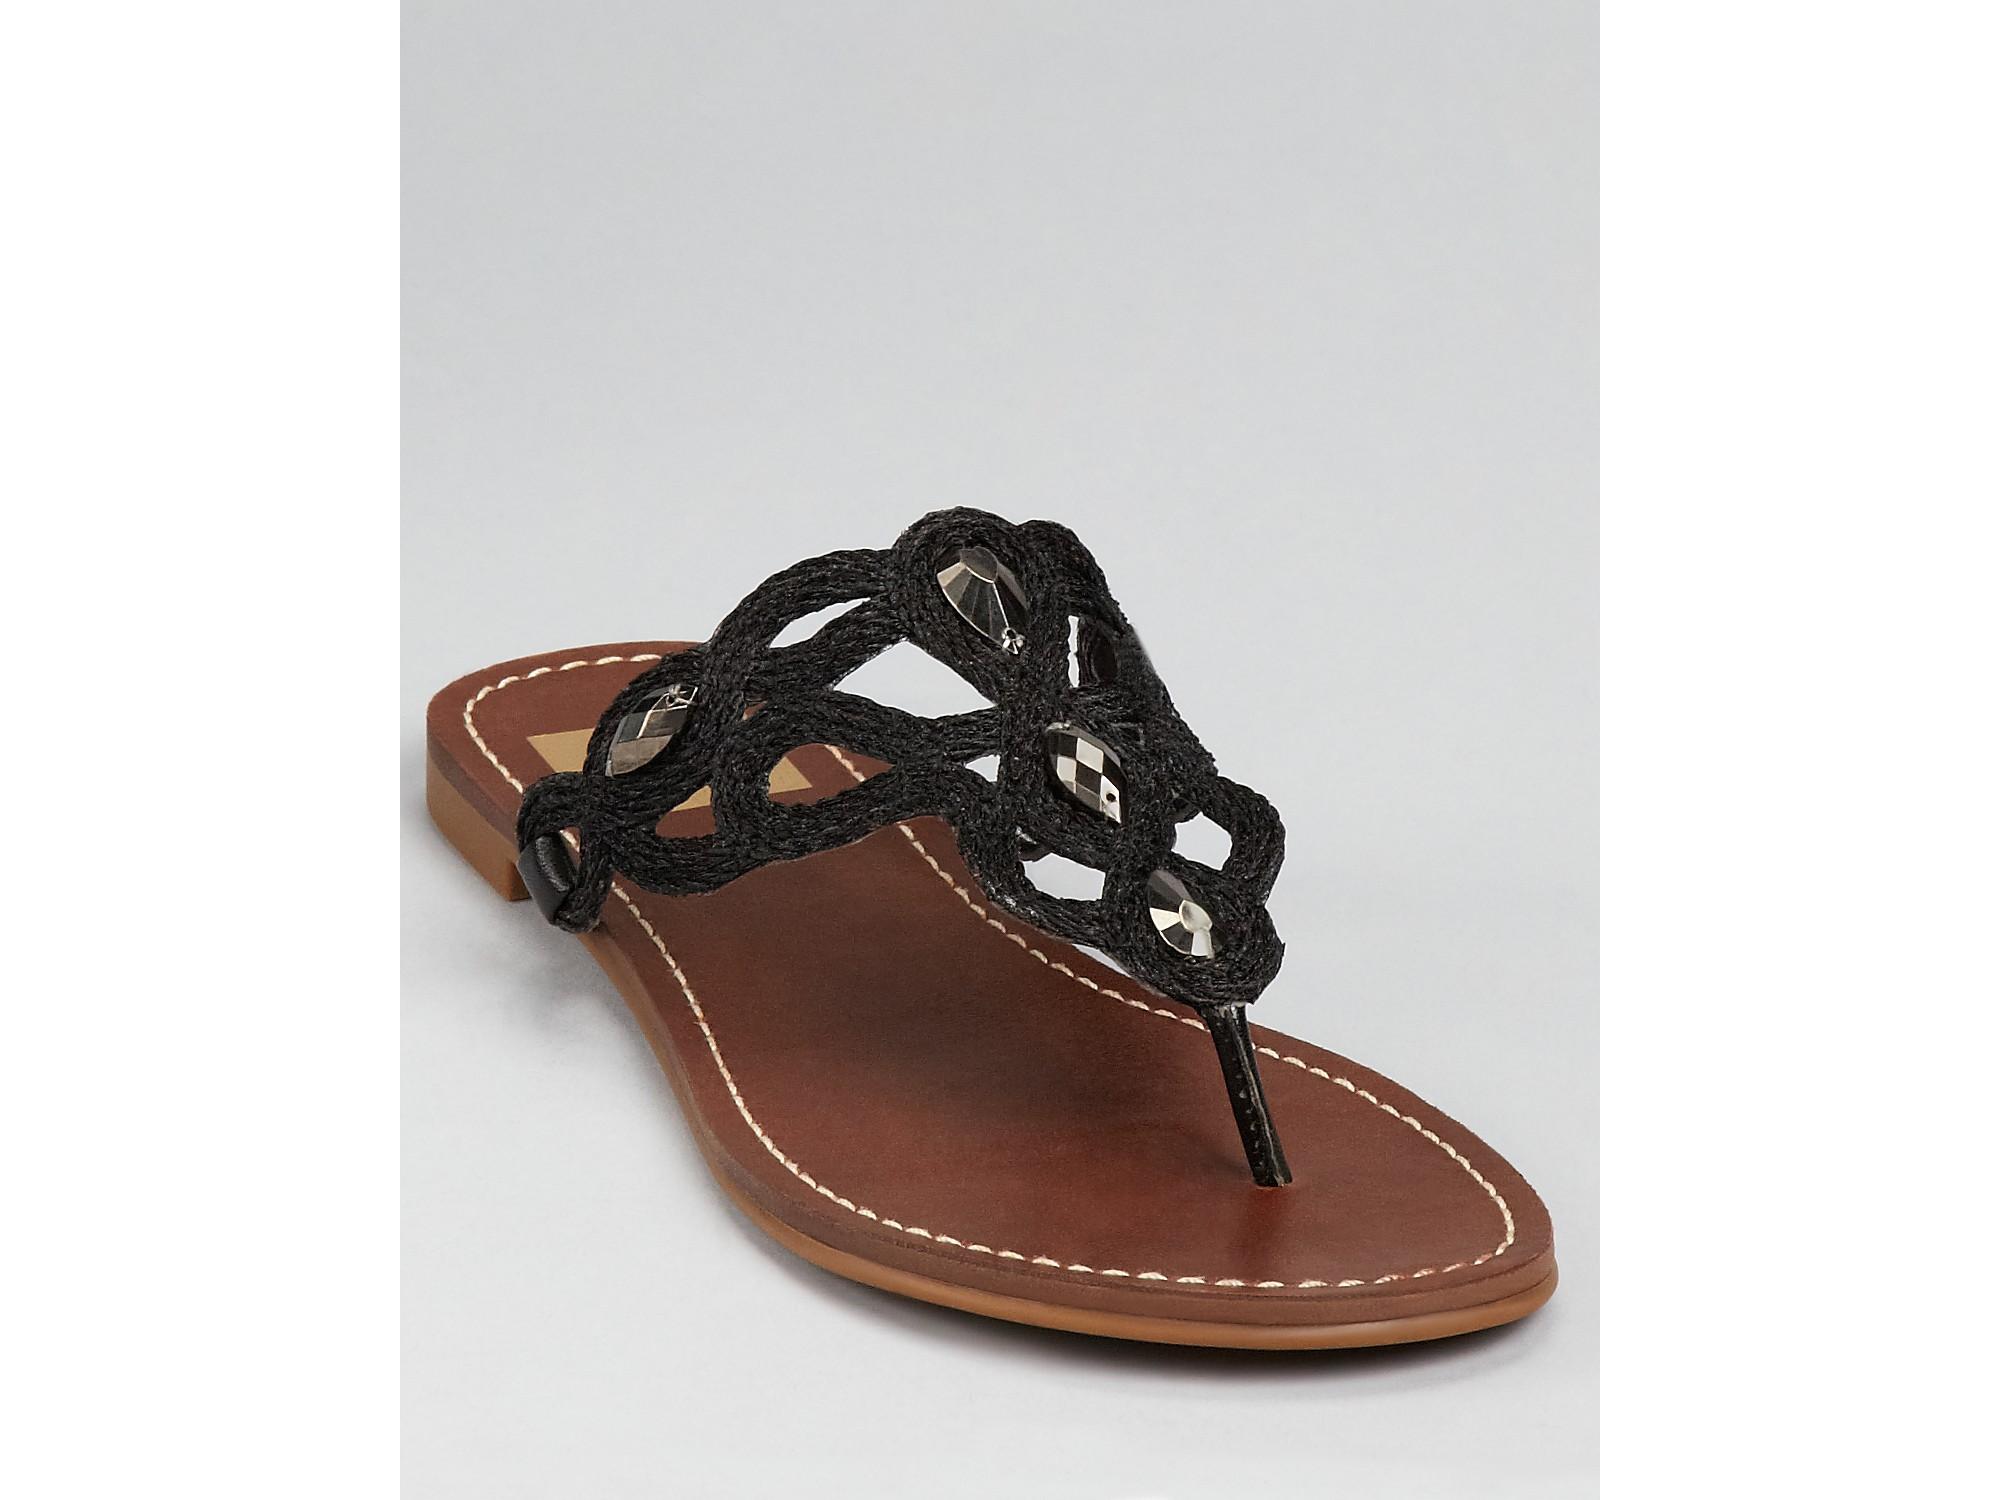 ff15501a0 Lyst - Dolce Vita Dv Sandals Sabra Thong in Black